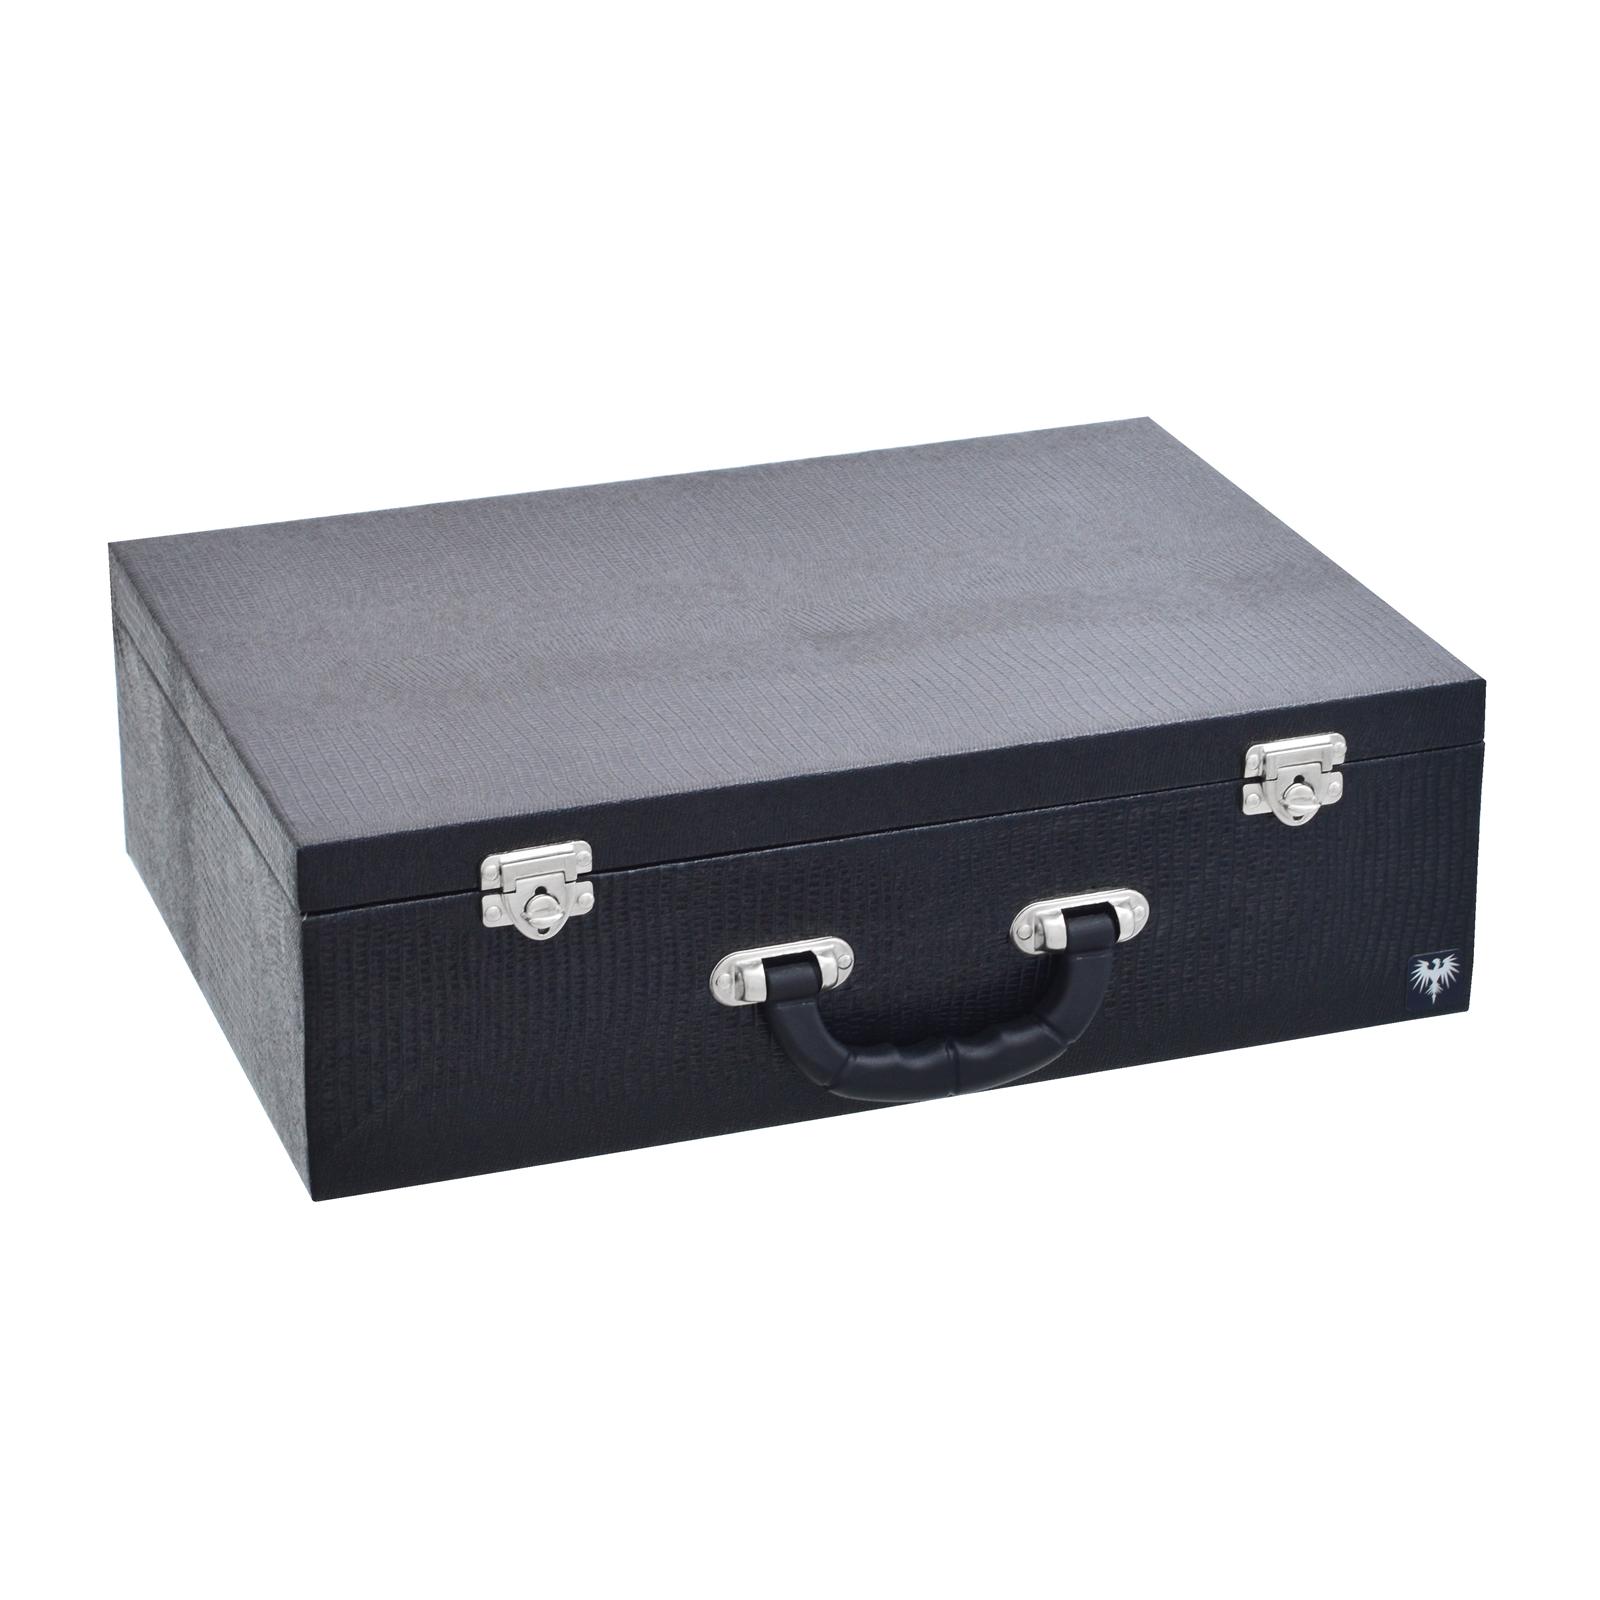 maleta-porta-relogio-36-nichos-couro-ecologico-preto-preto-imagem-2.JPG